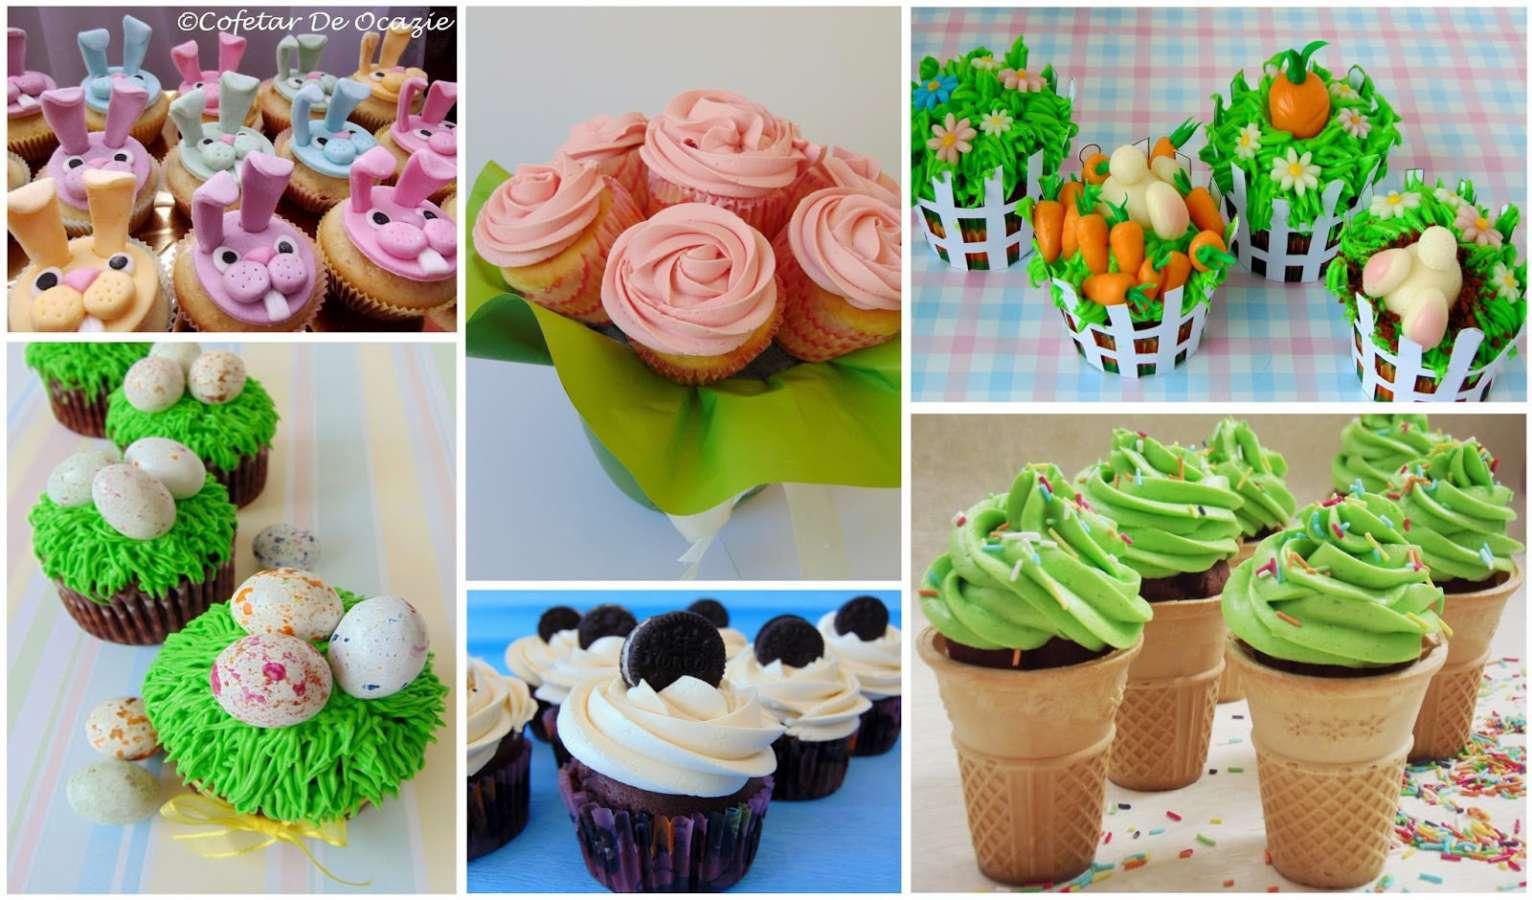 Cupcakes festive de primavara / Spring Festive Cupcakes